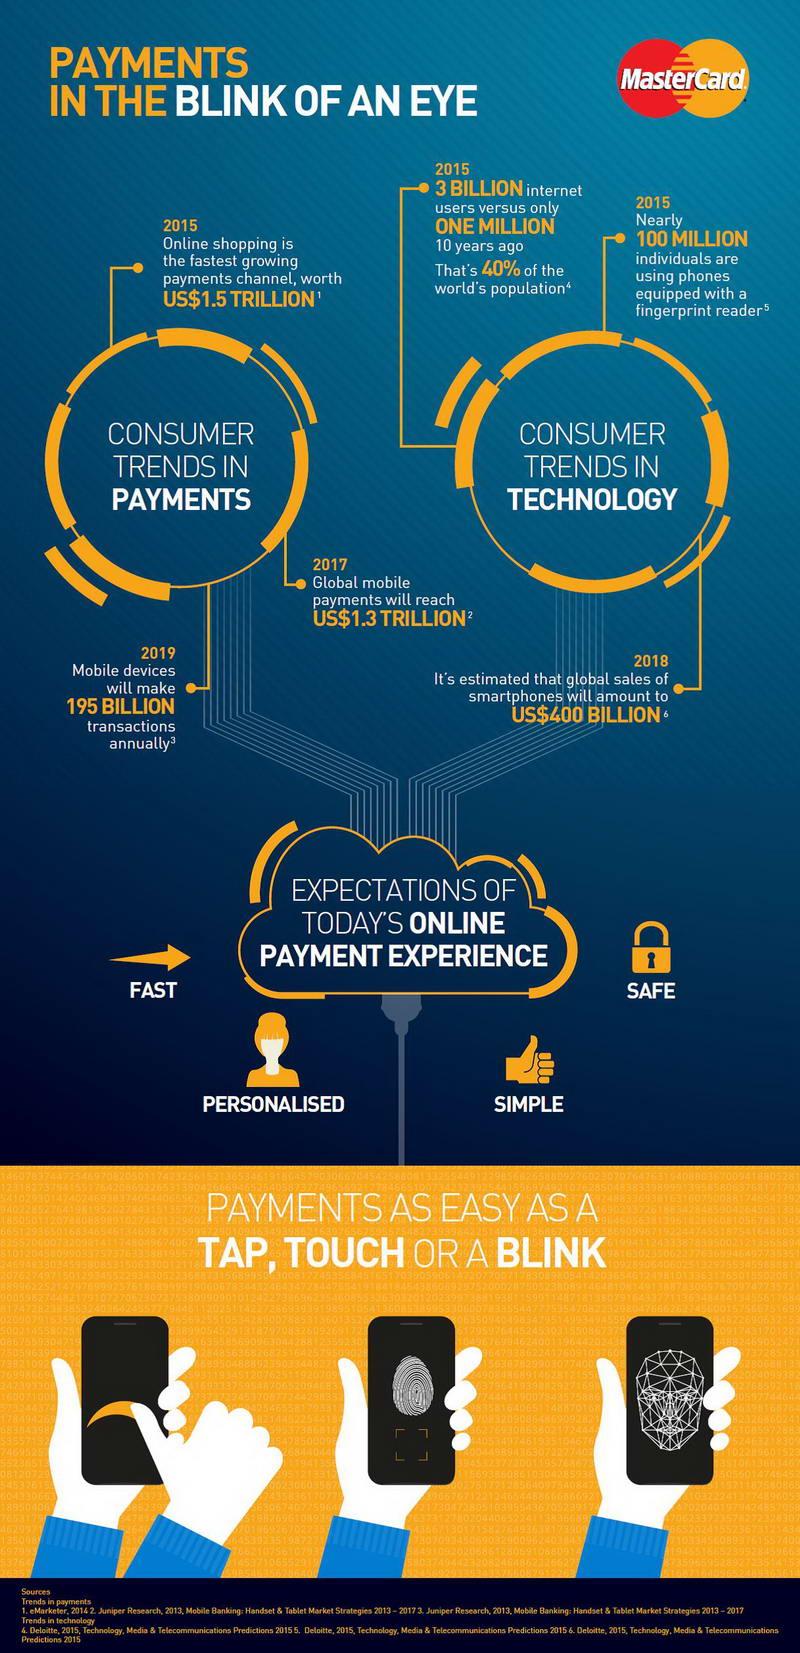 resize-mastercard-biometric-infographic-02-16